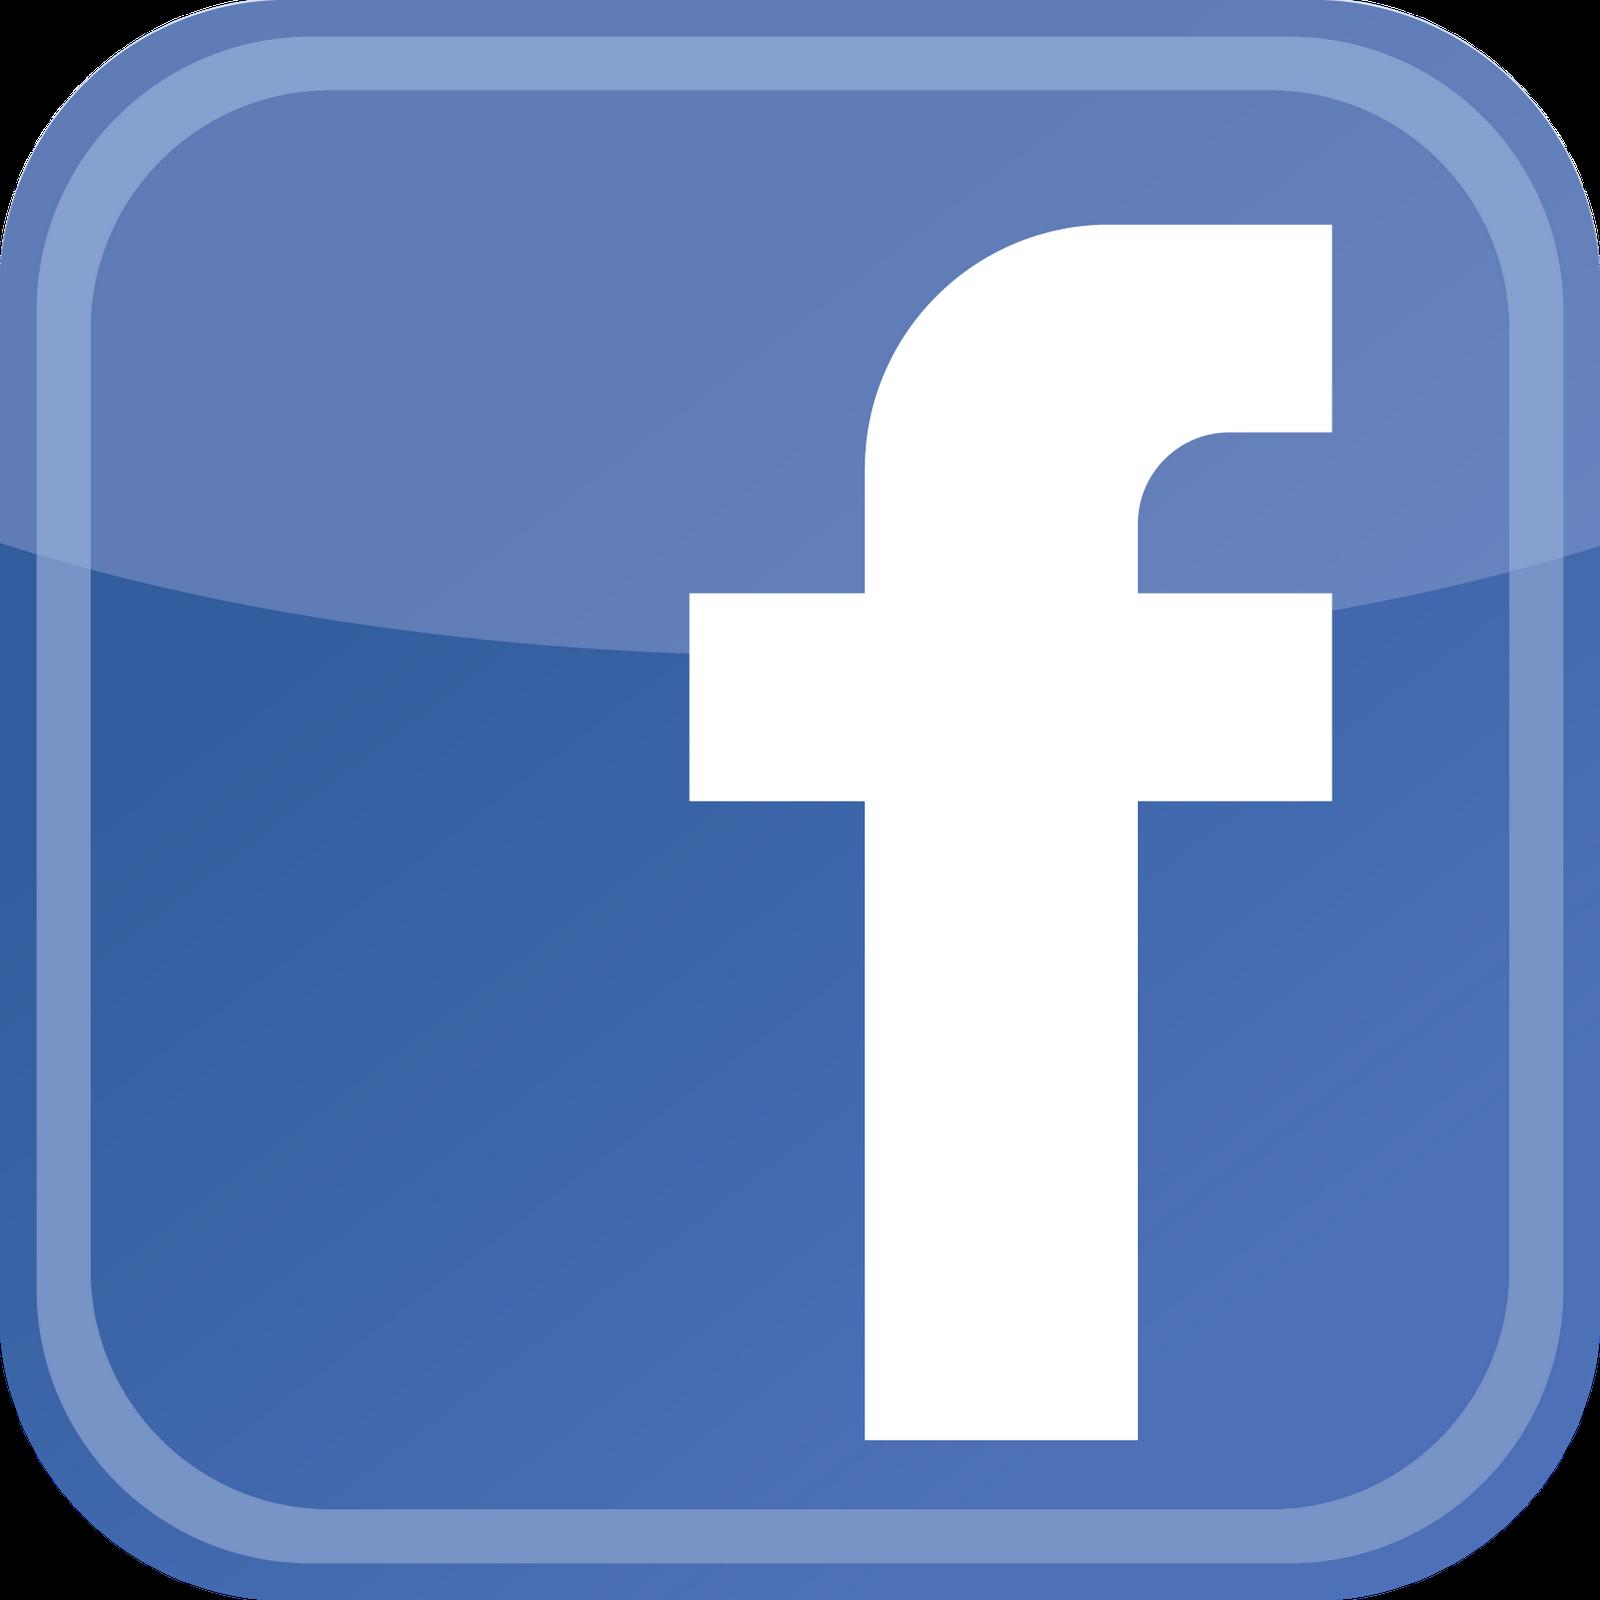 logo_facebook-80.png?nocache=1367848085331